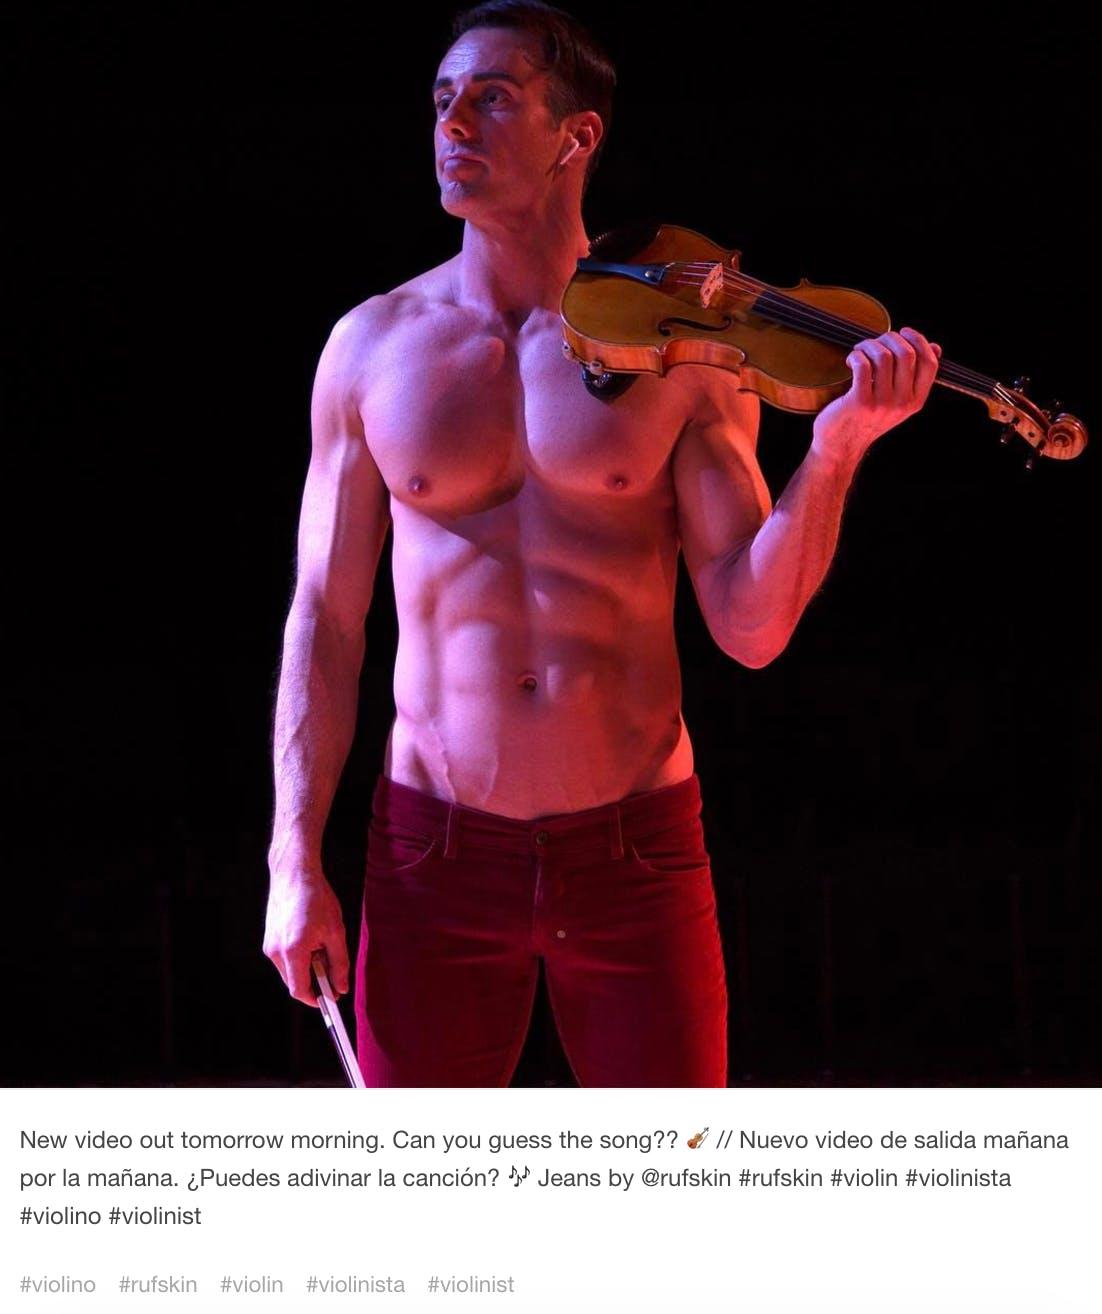 gay tumblr : the shirtless violinist